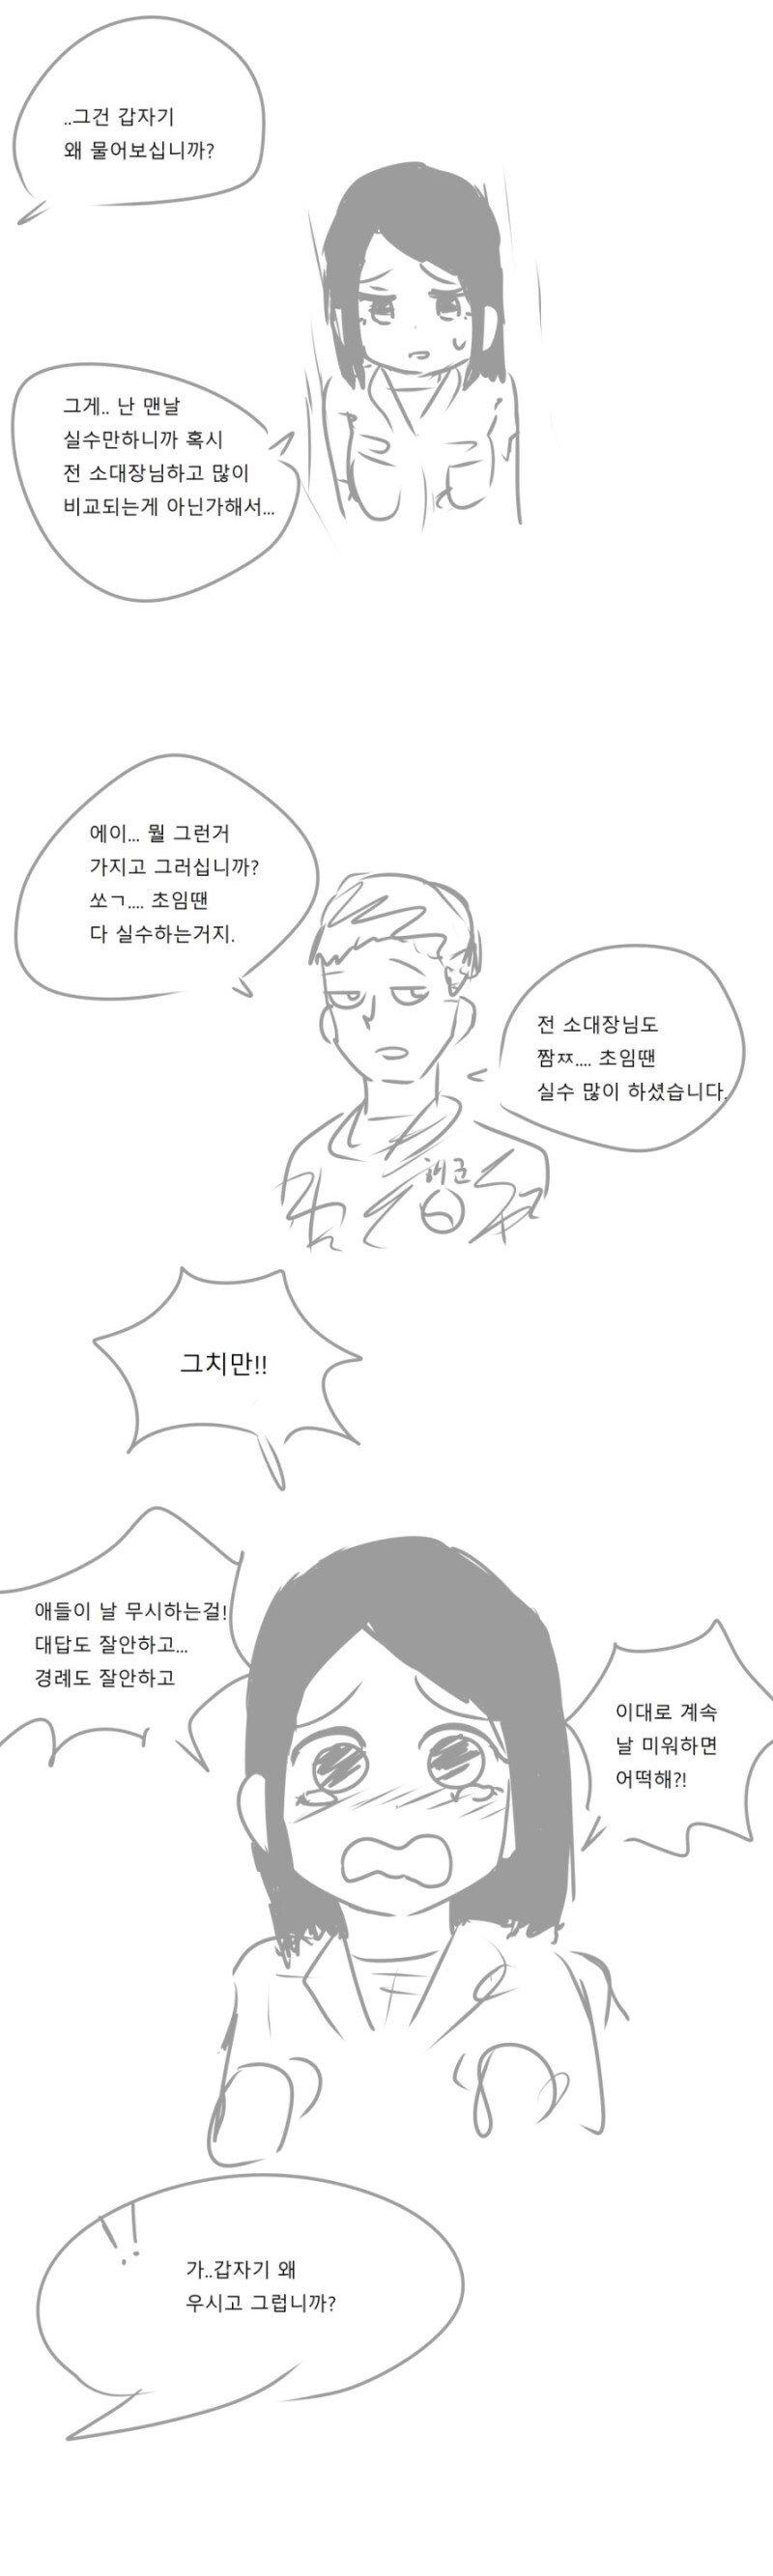 7.jpg 신임소대장이 커여운 여군인.Manhwa